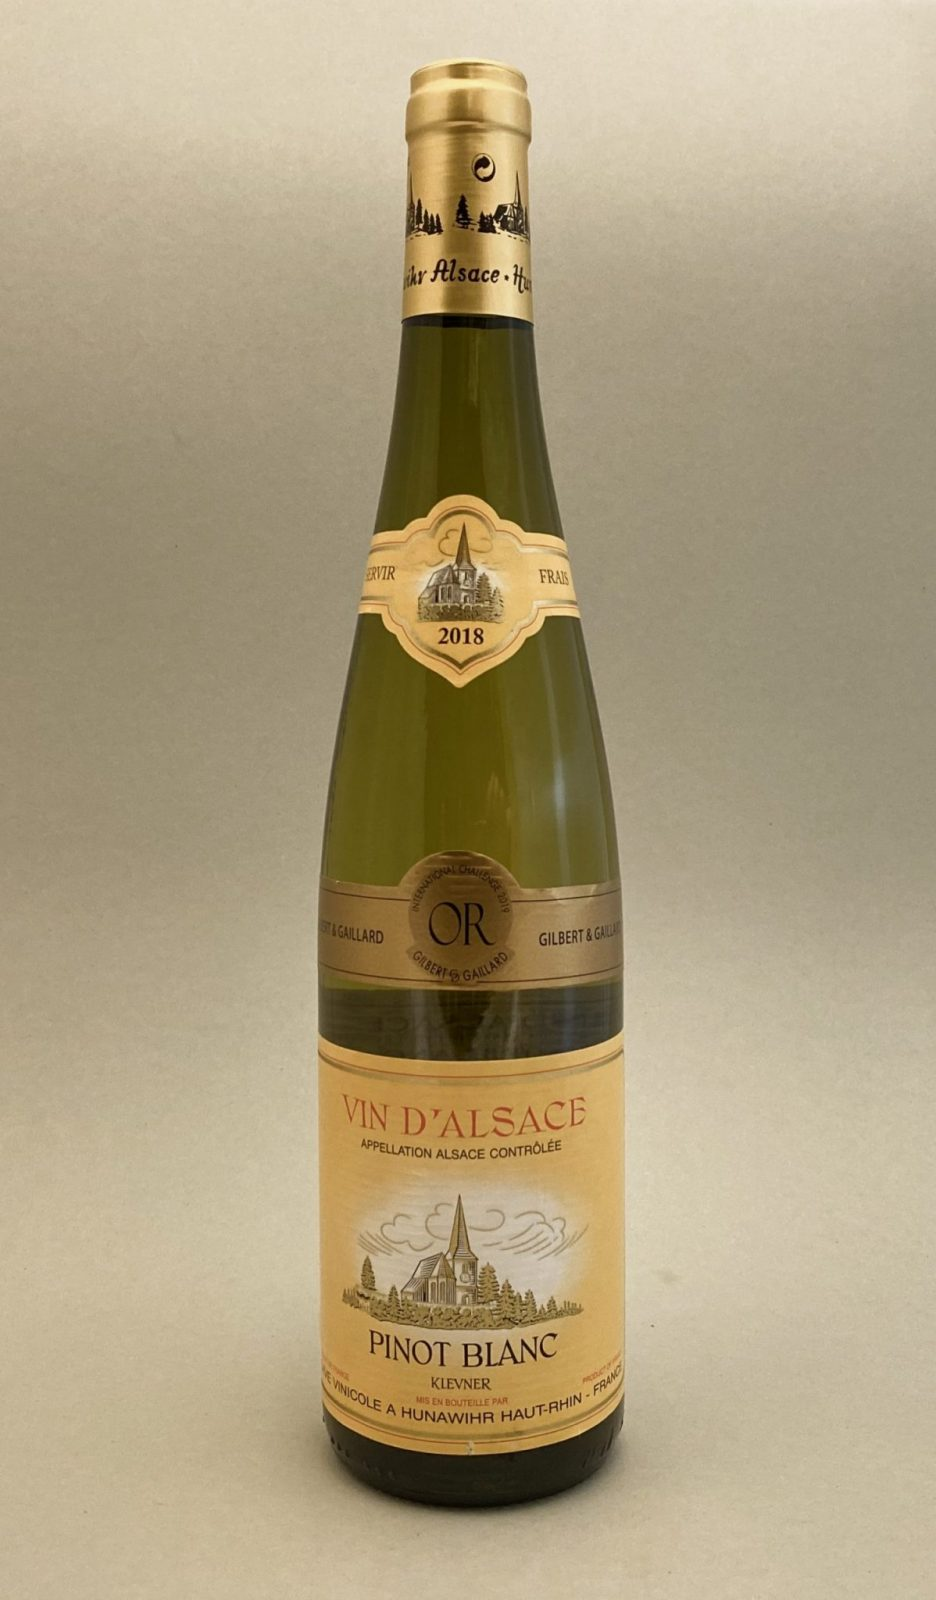 HUNAWIHR Vin D'Alsace Pinot Blanc 2018, vinoteka Bratislava slnecnice mesto, petrzalka, vino biele z Francúzska